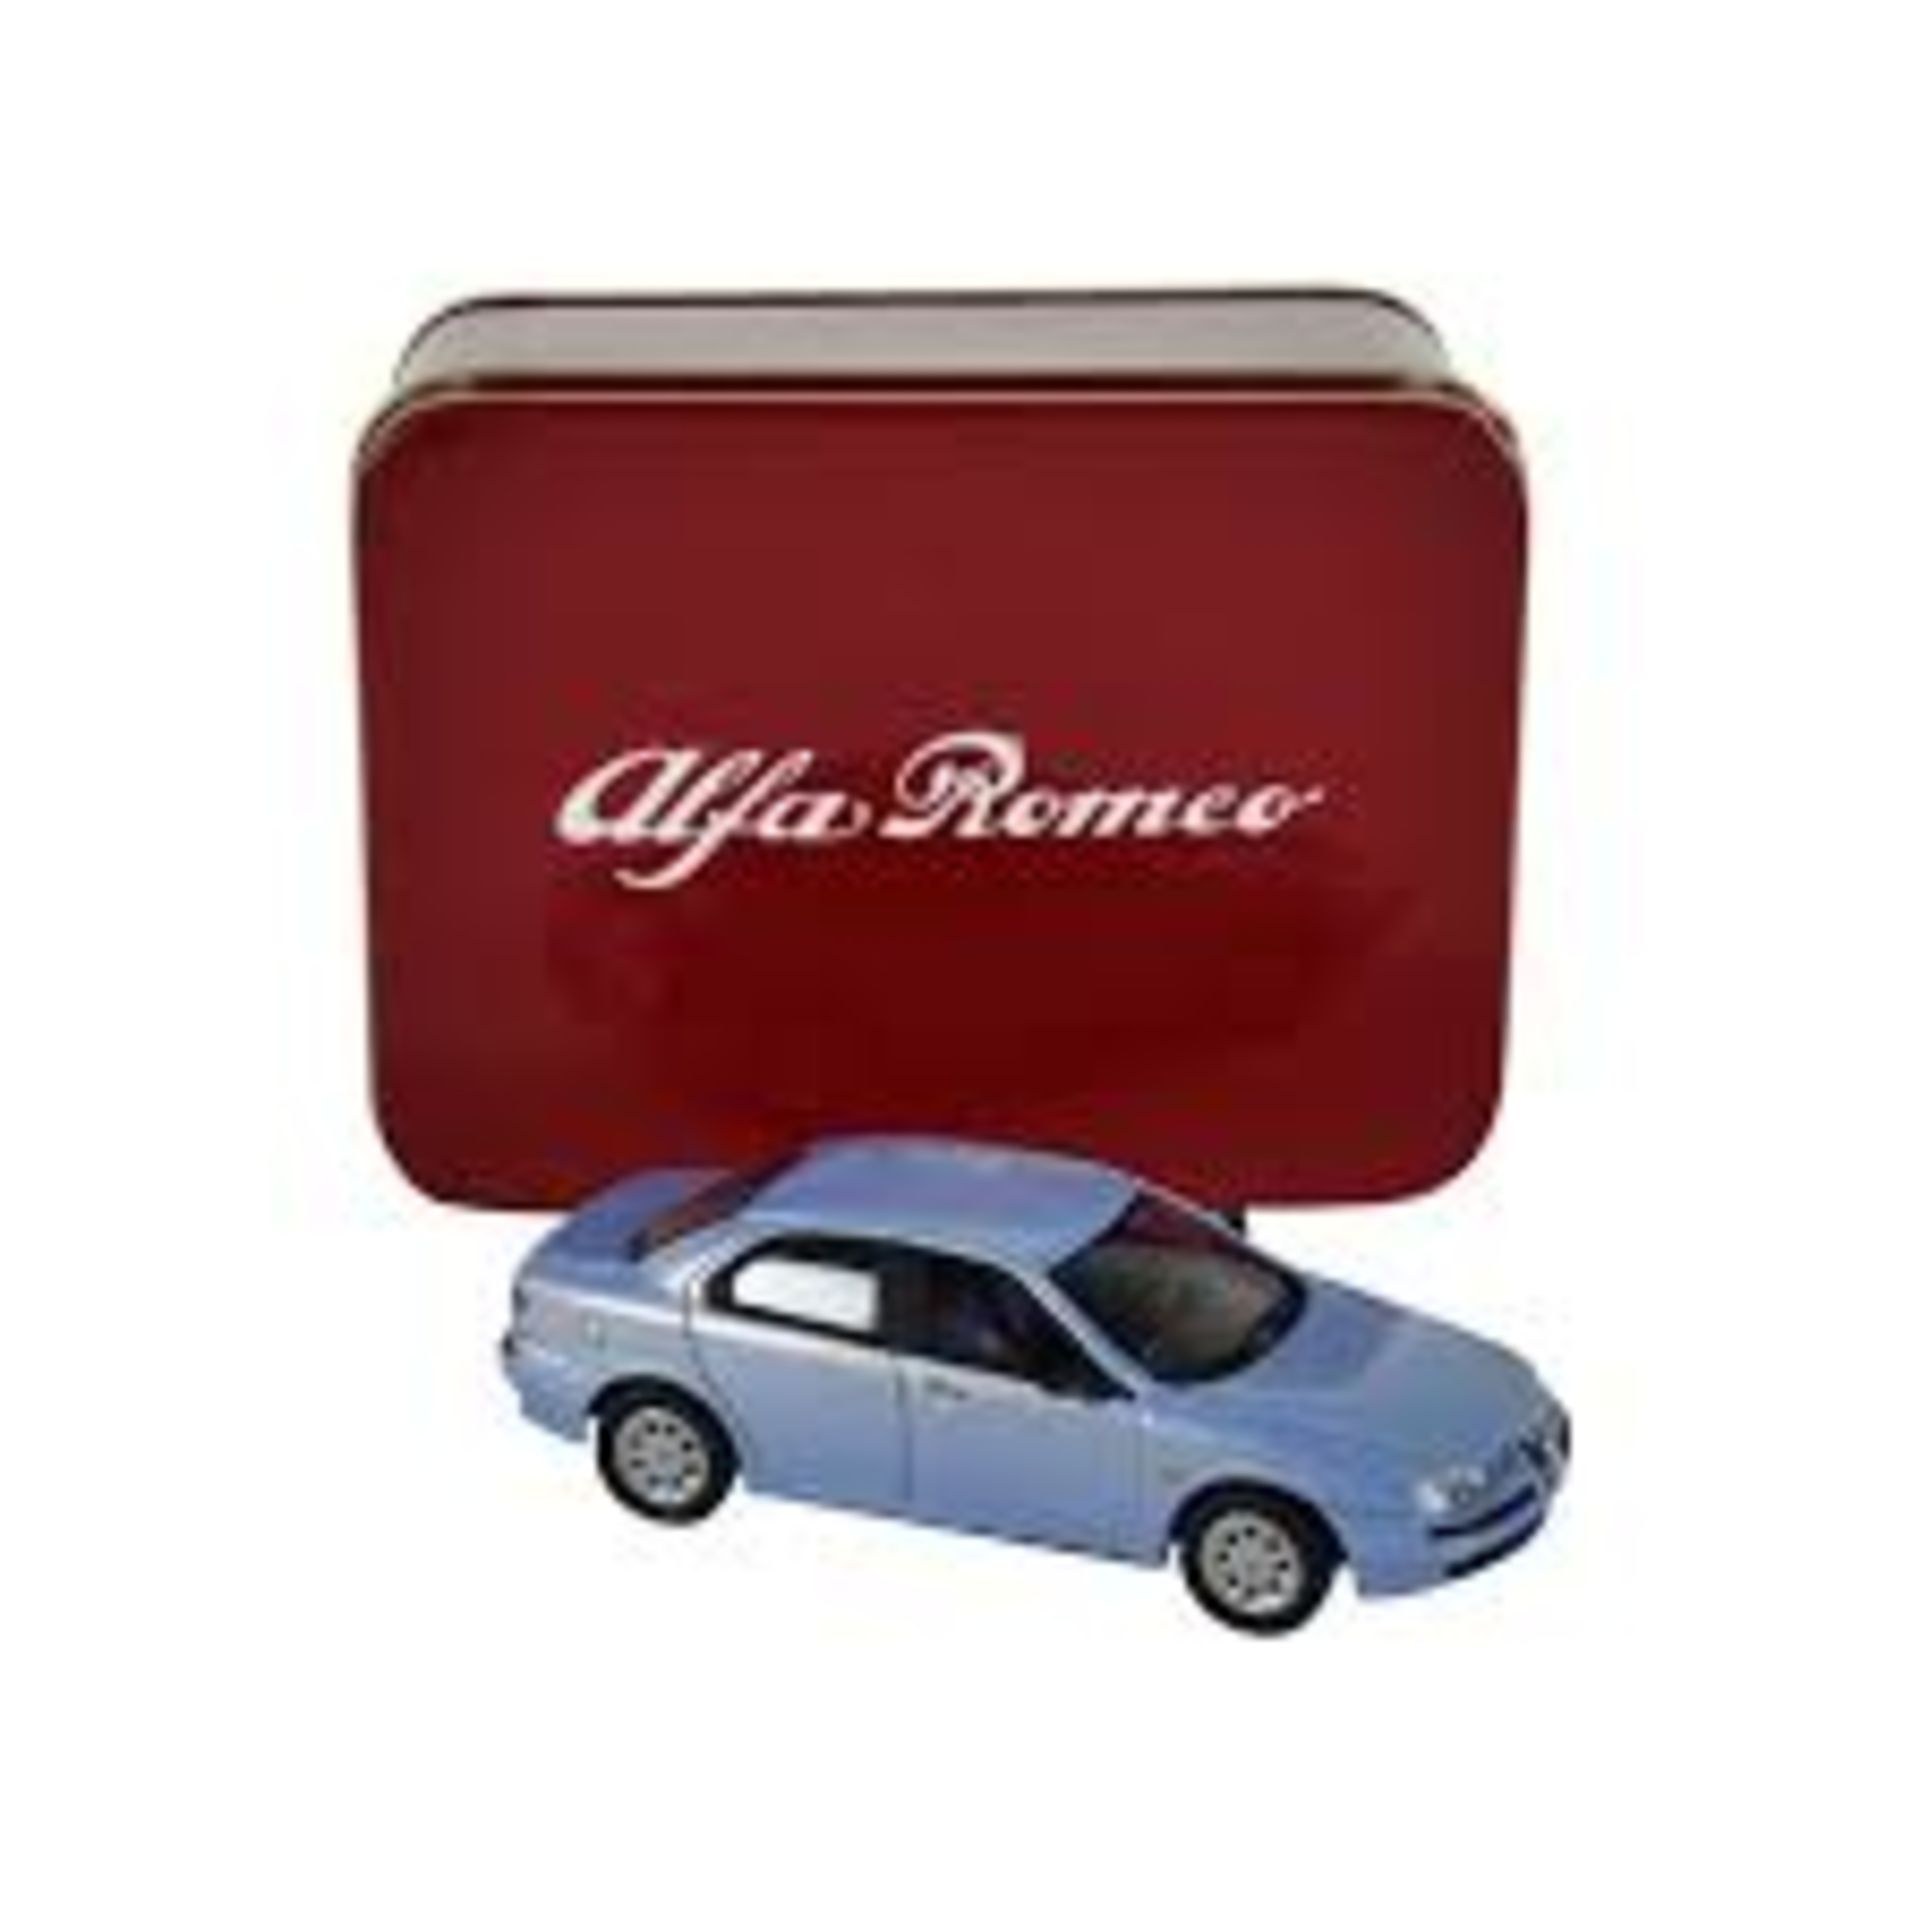 Lot 10364 - V Brand New 1/43 Diecast 1998 Alfa Romeo 156 - eBay Price £16.99